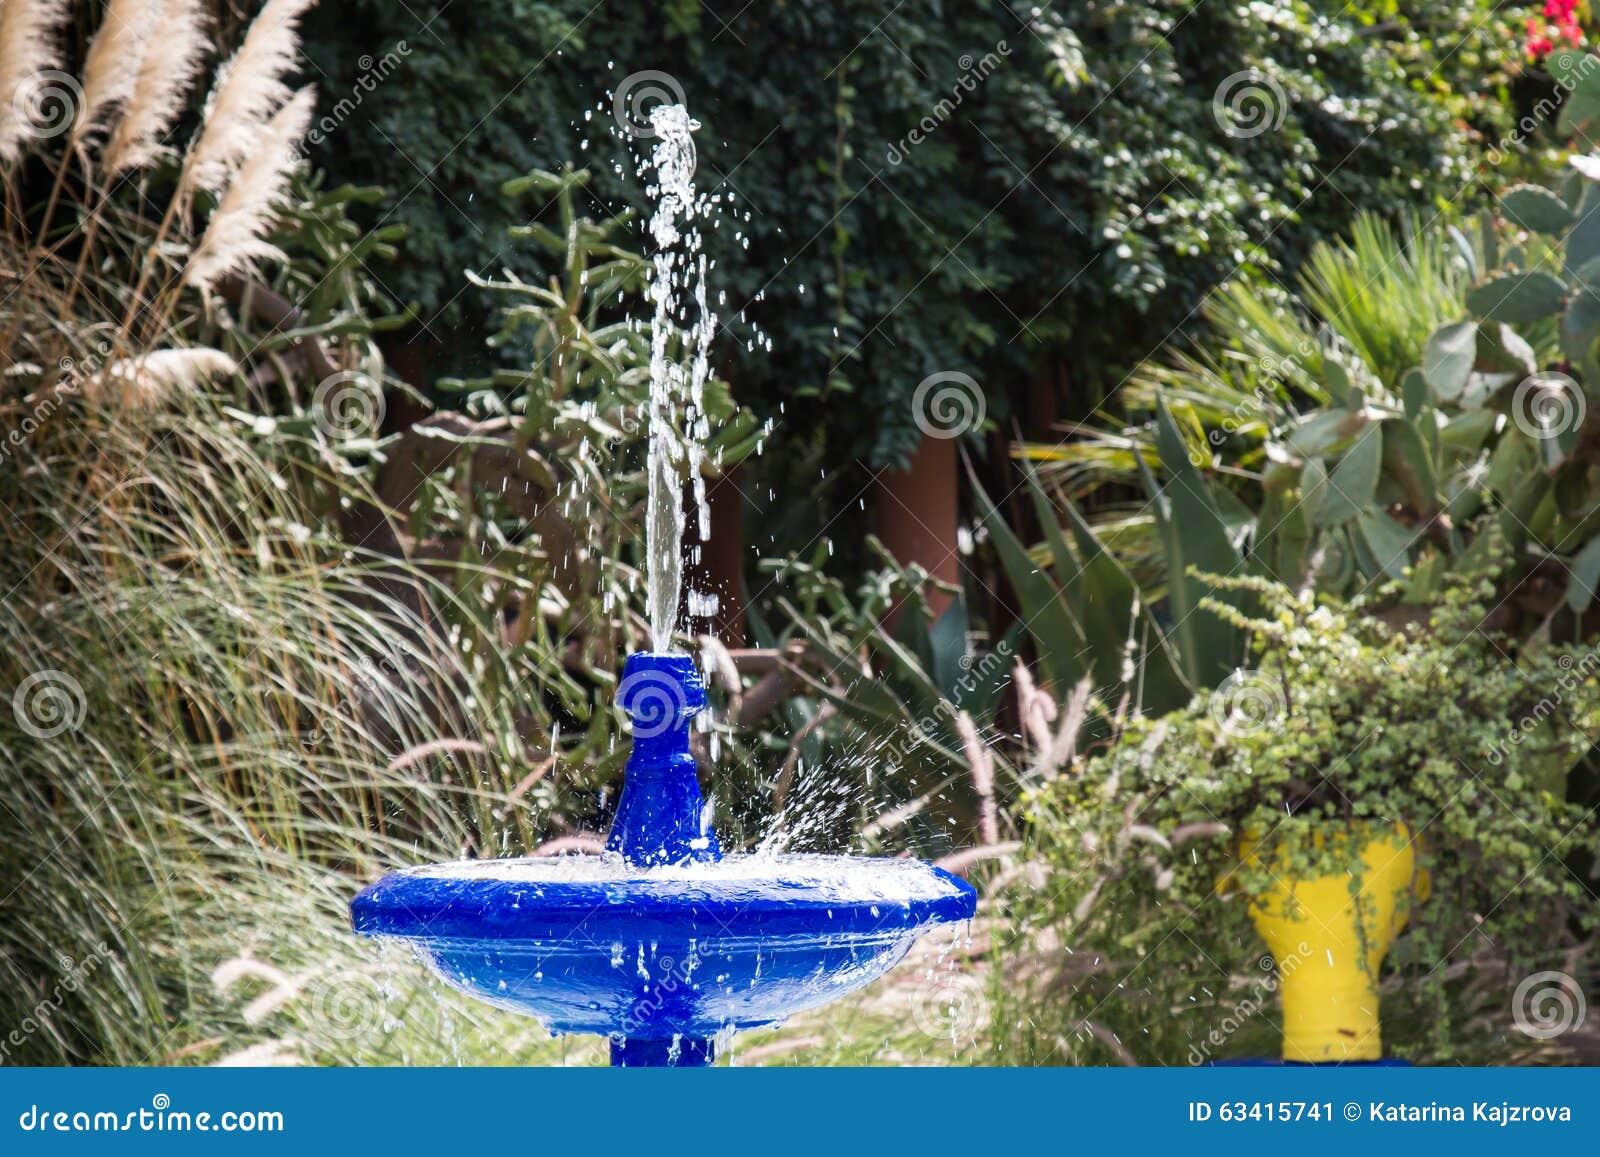 Fontaine Dans Jardin Majorelle Marrakech Maroc Image Stock Image